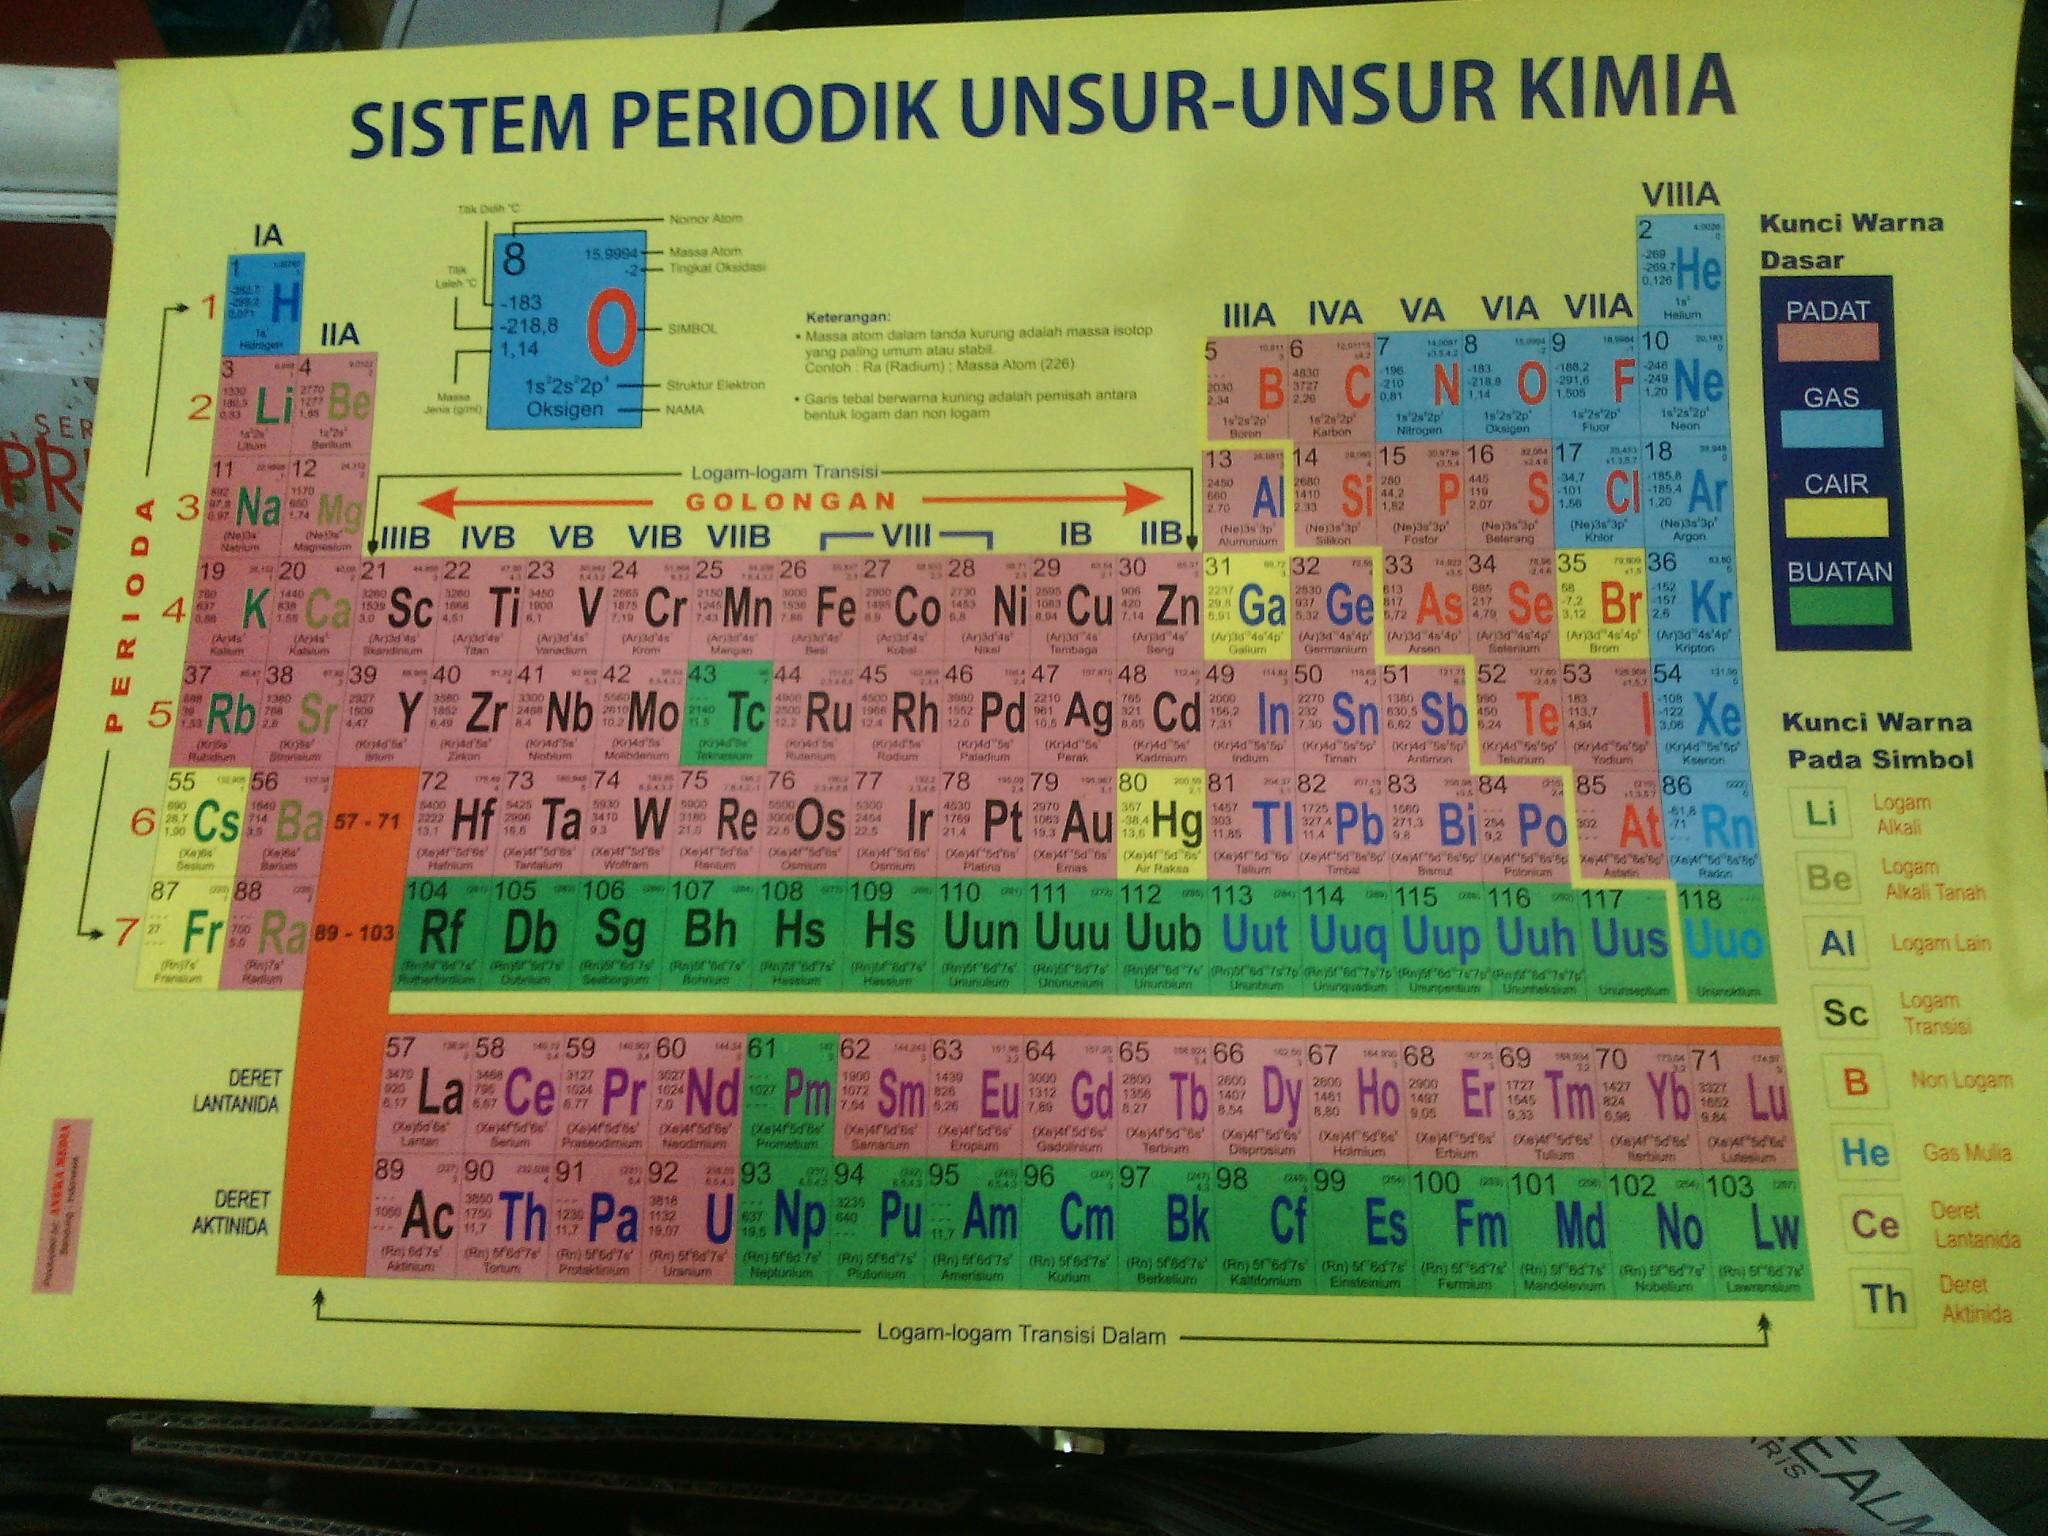 Tabel periodik unsur kimia lengkap - cfaradobad